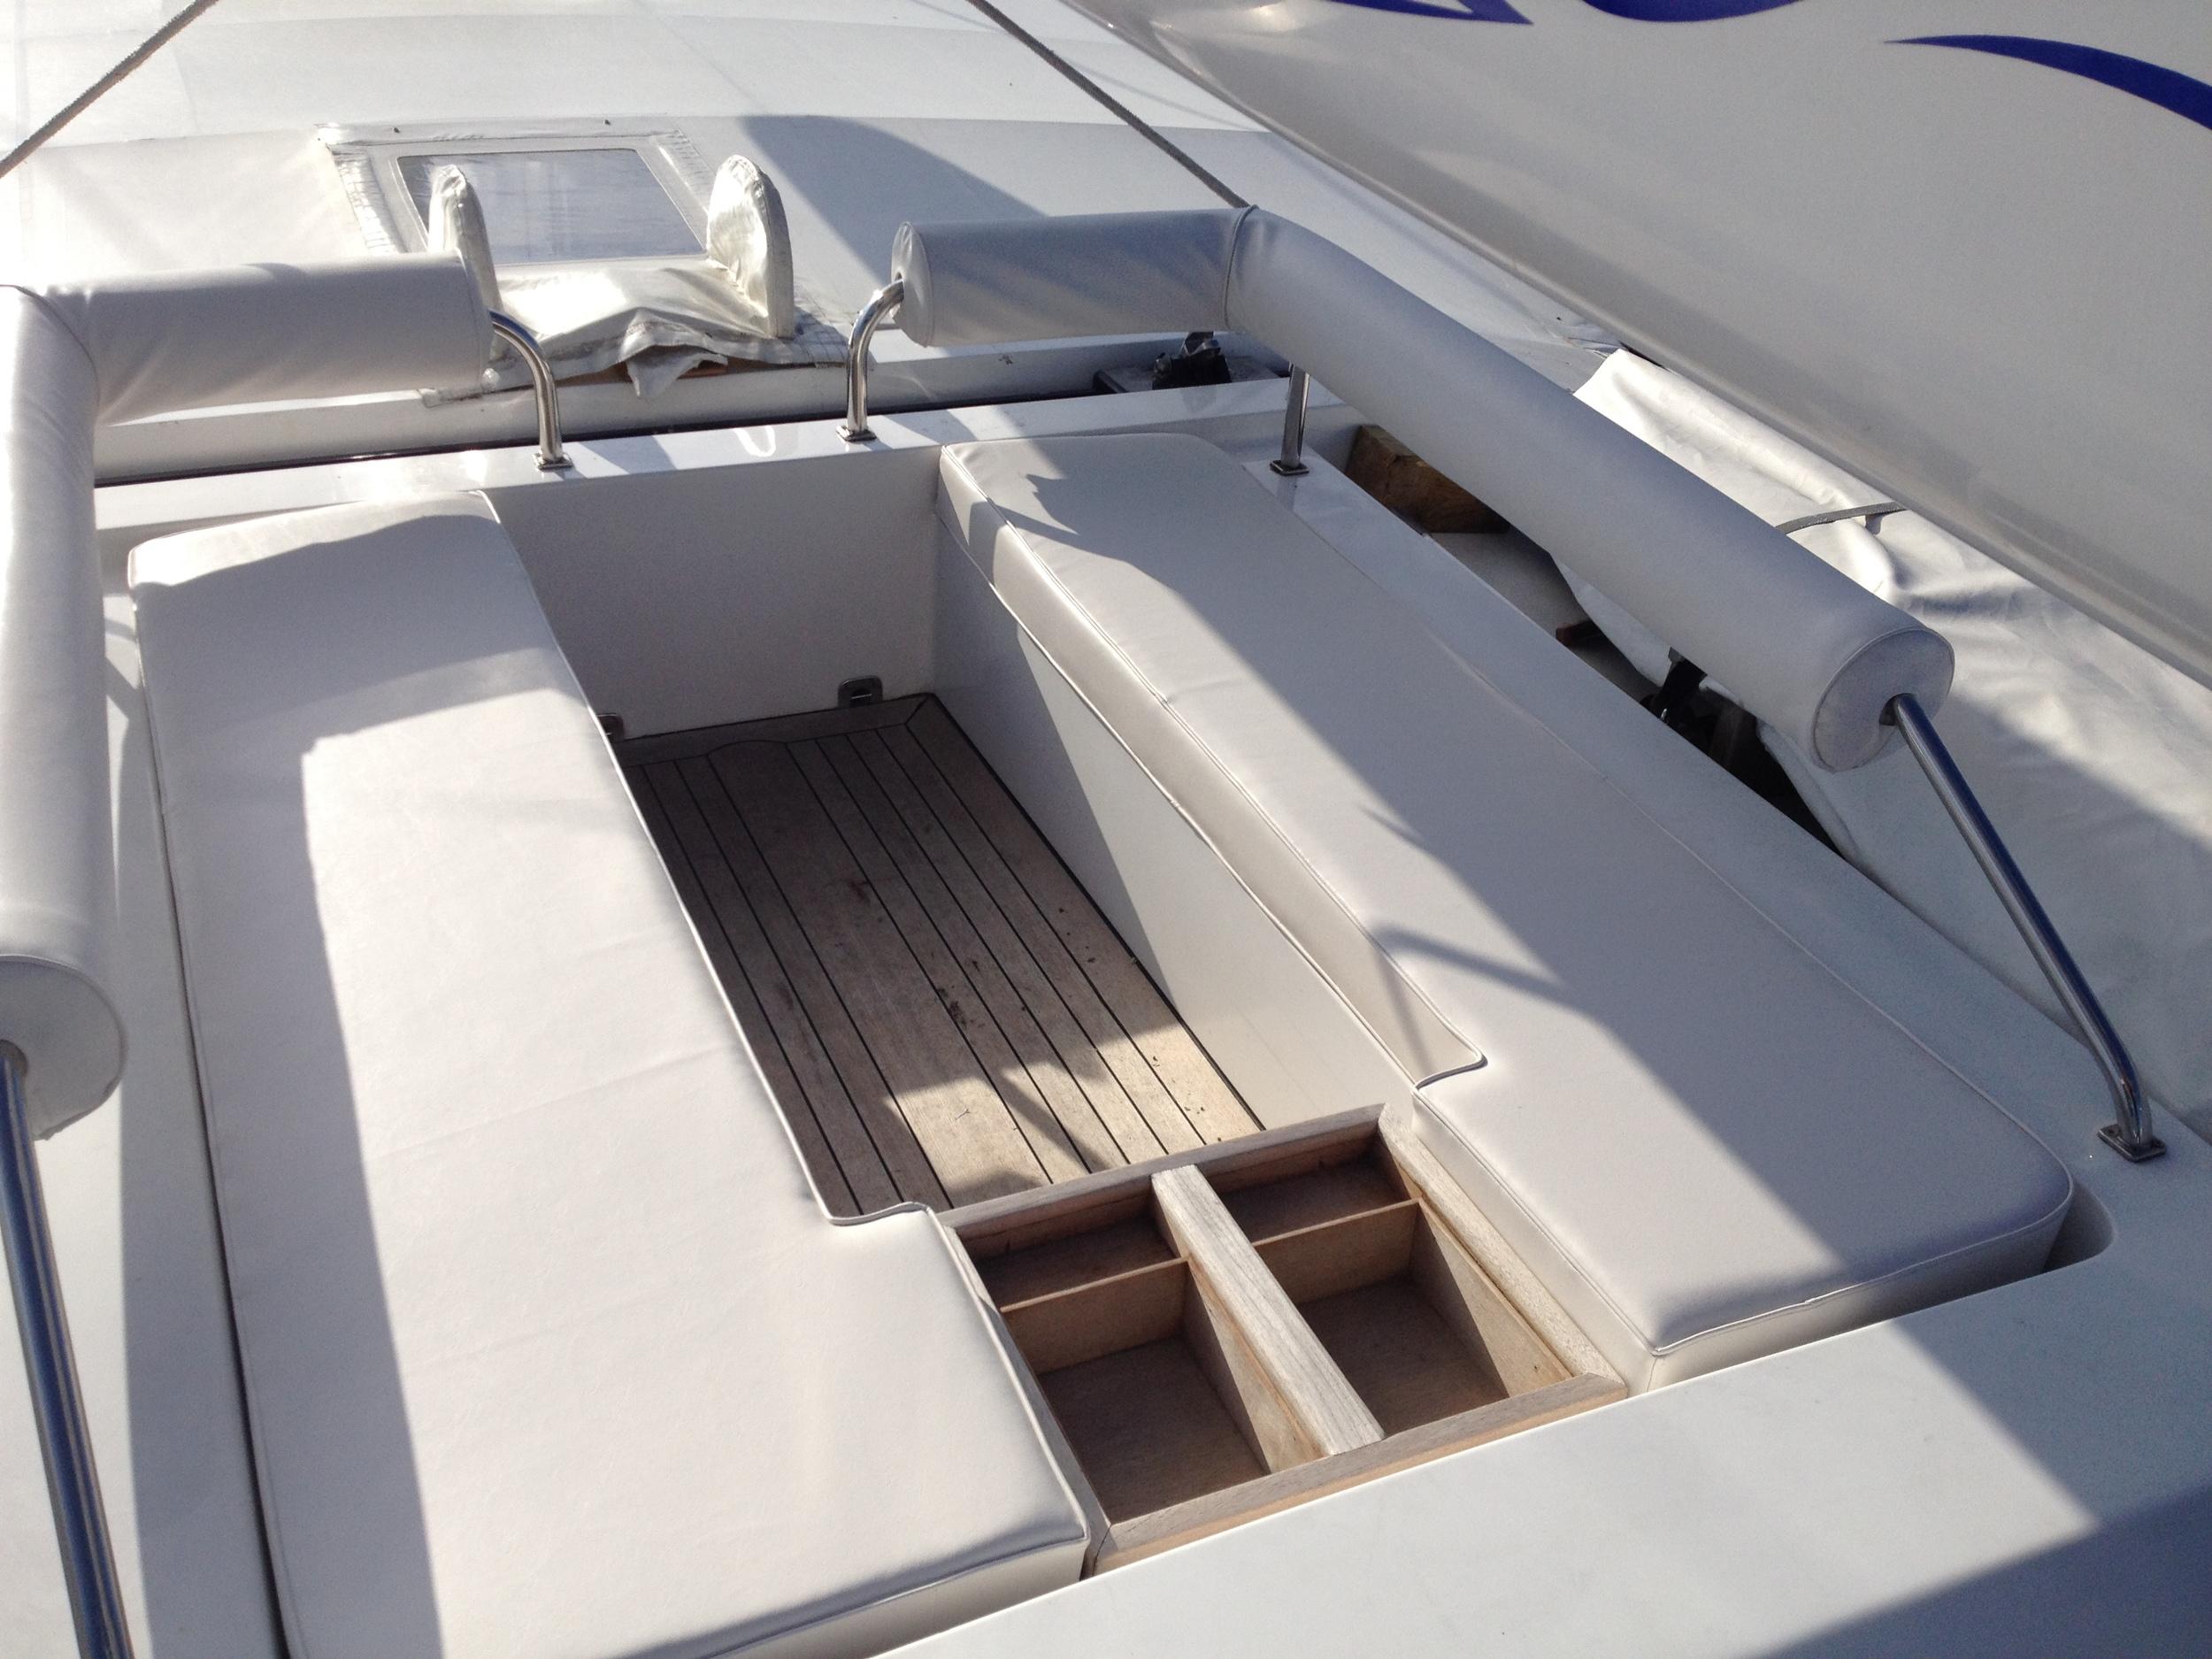 Boat Upholstery Yacht Cushions Rhode Island Maloney Interiors SeaQuell.JPG